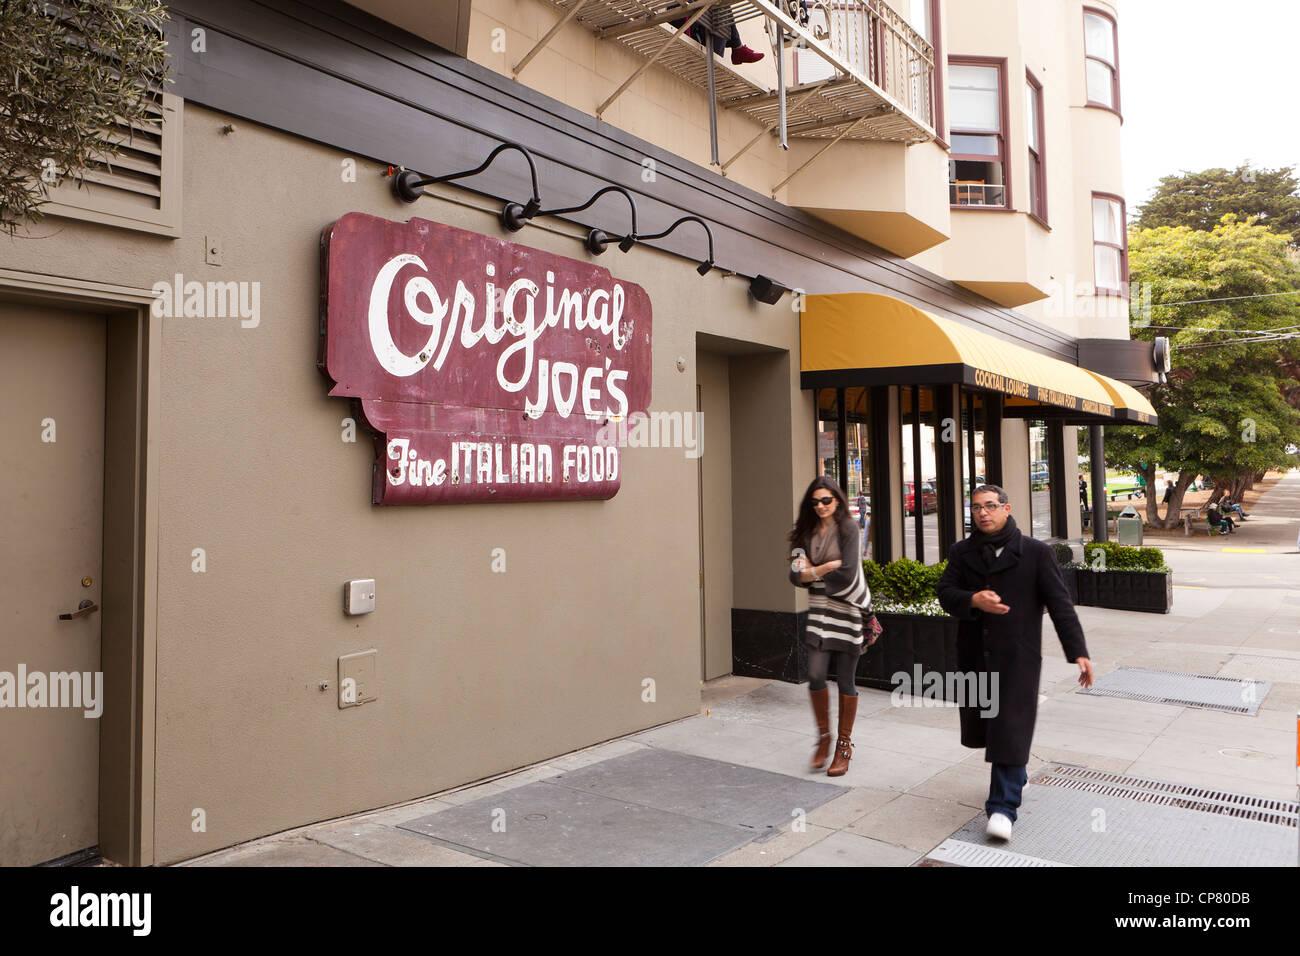 Joe's Original restaurant sign dans la Petite Italie, San Francisco Photo Stock